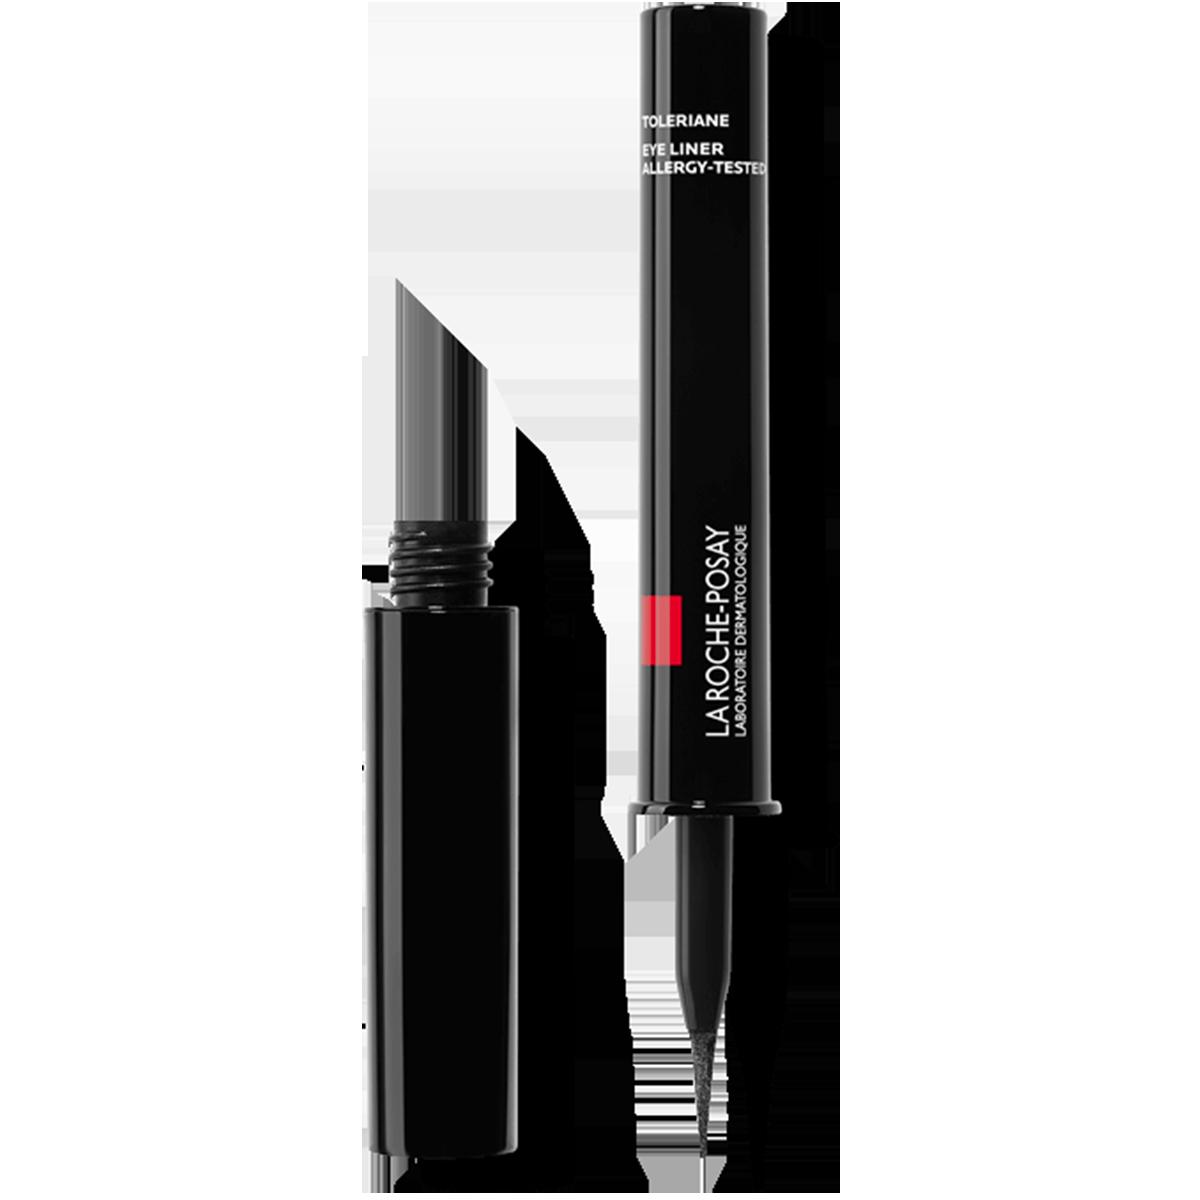 La Roche Posay Känslig Toleriane Make up EYELINER Black 343342240304